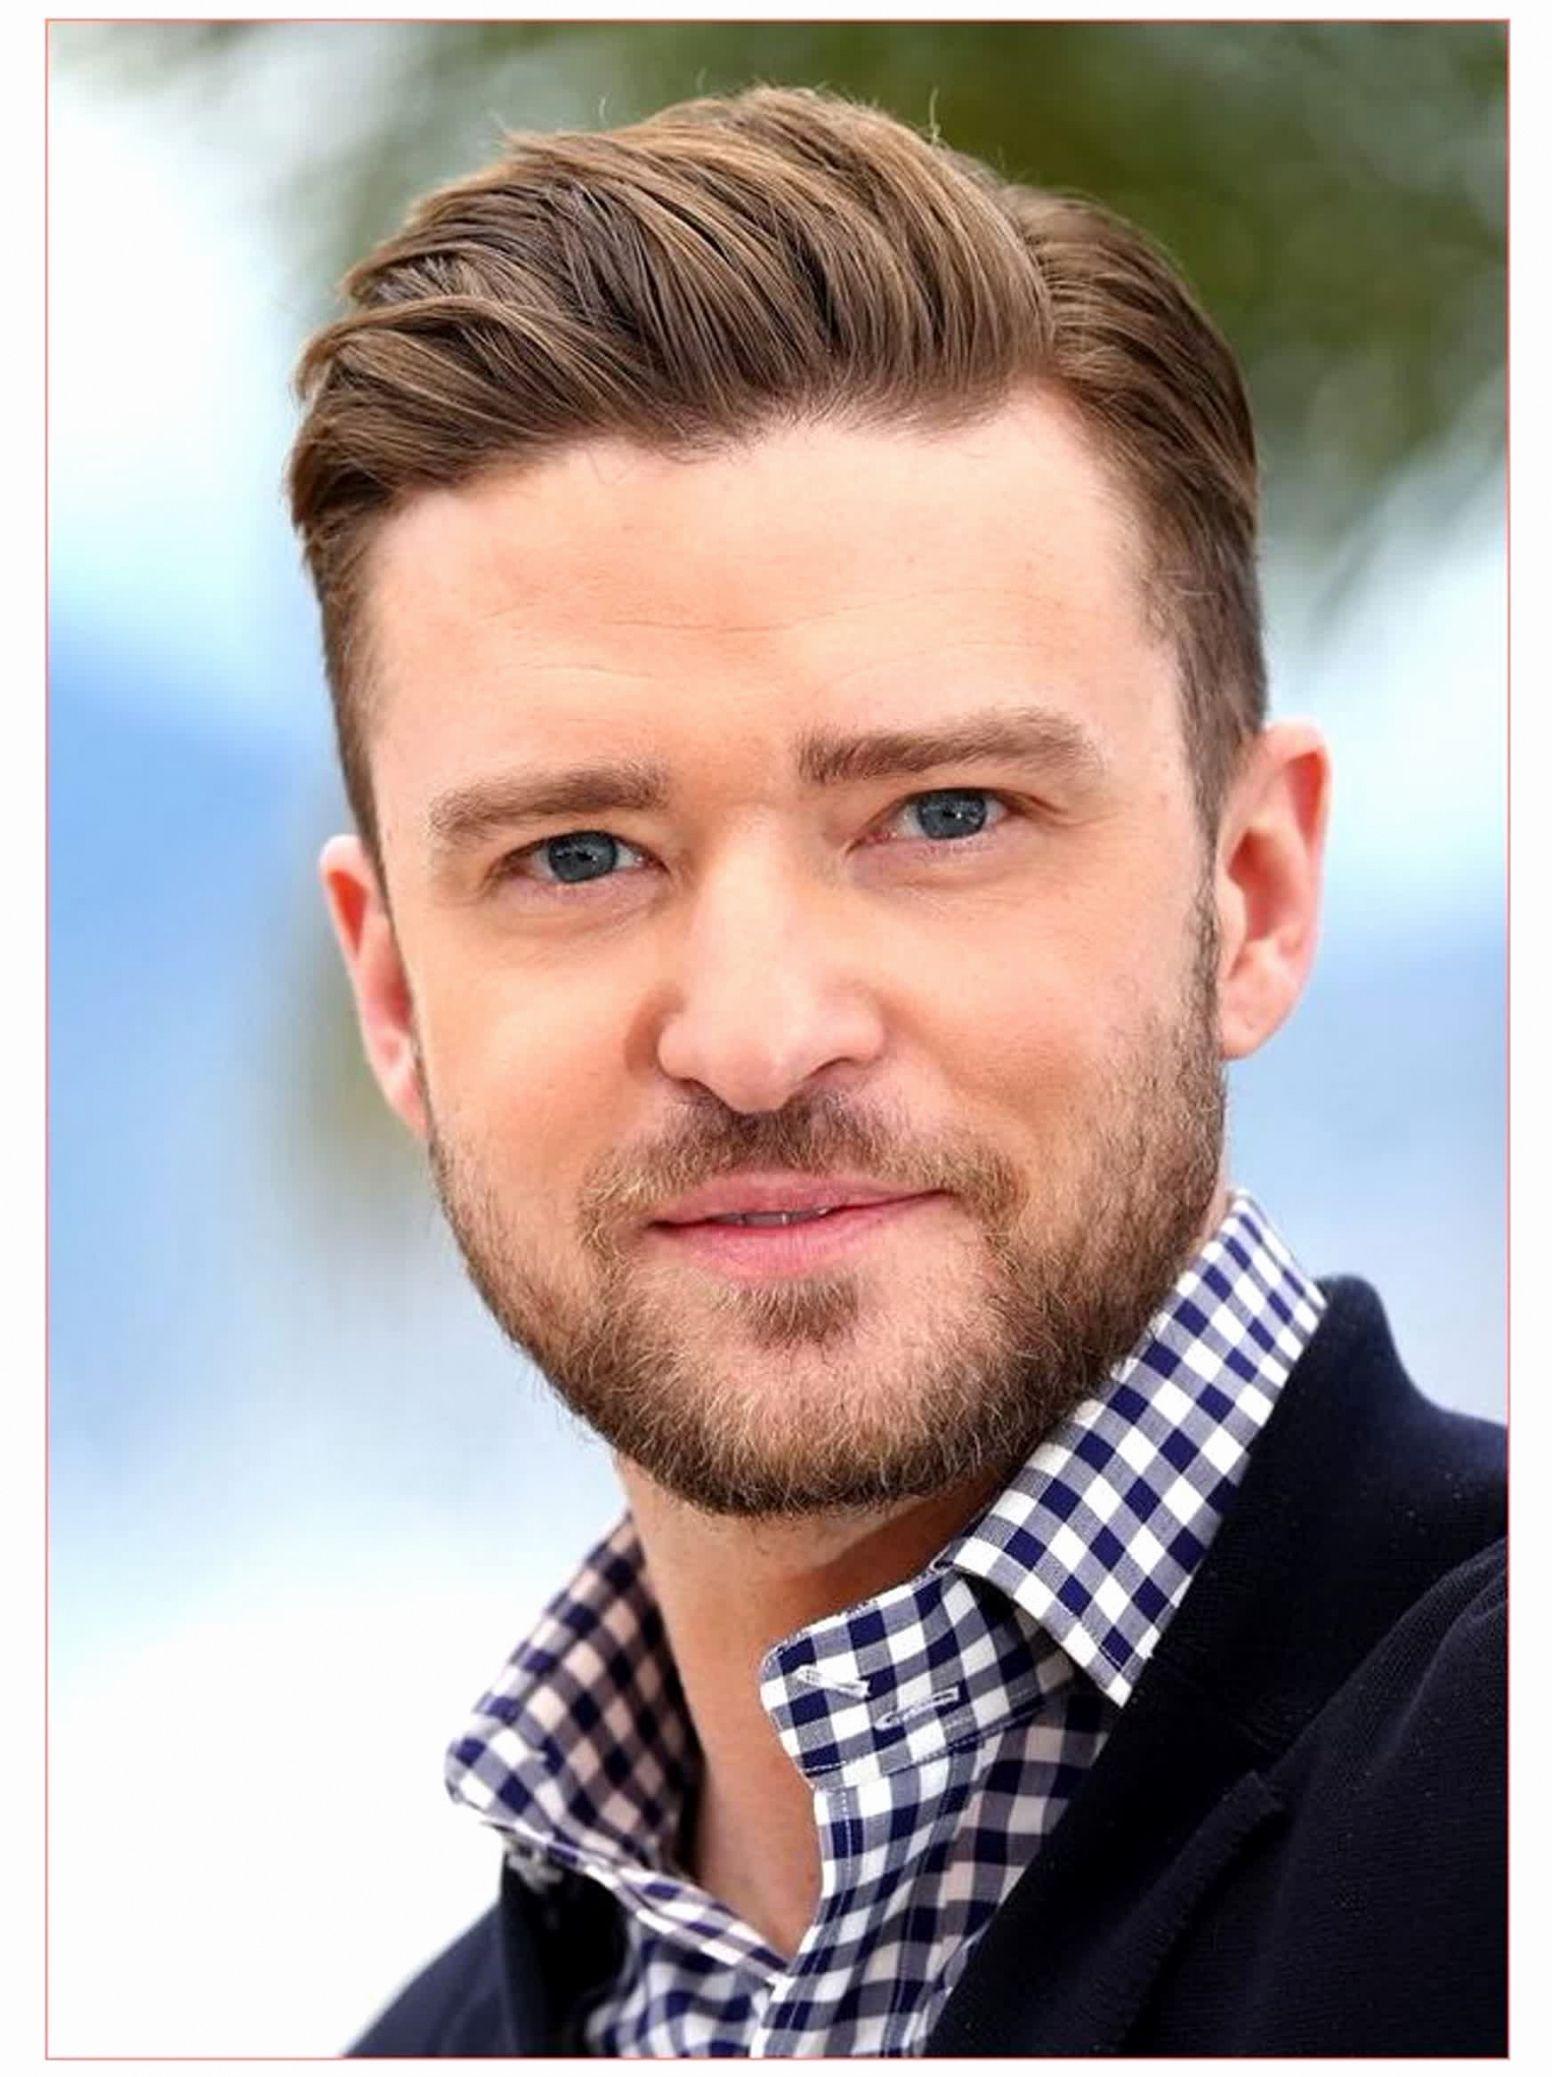 men's hairstyles 40 year old #hairstyles #menhairstyles